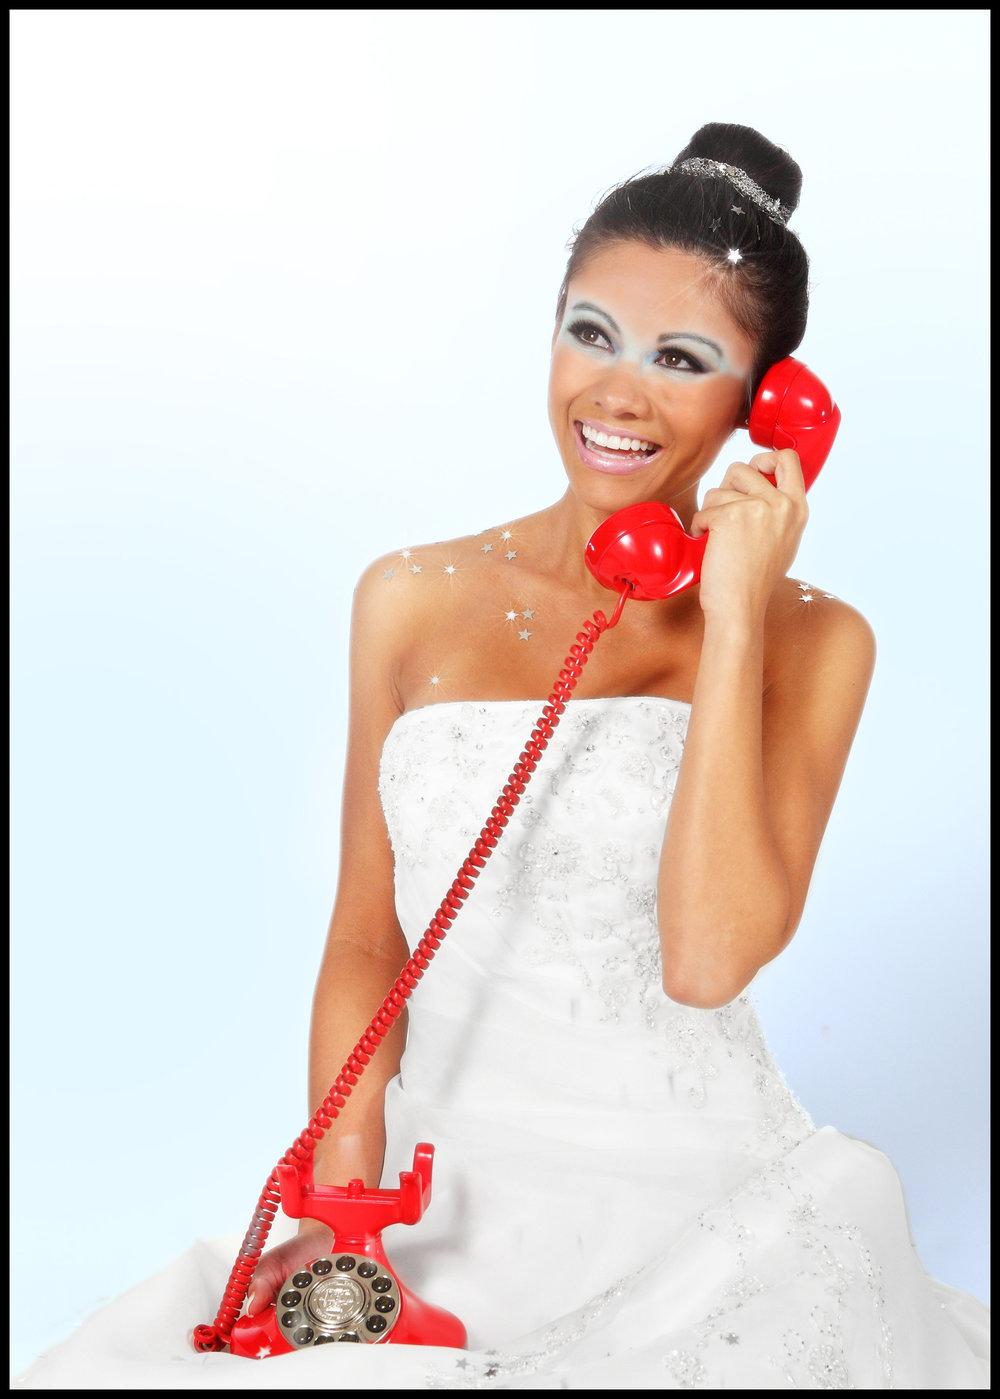 Model: Christin C.